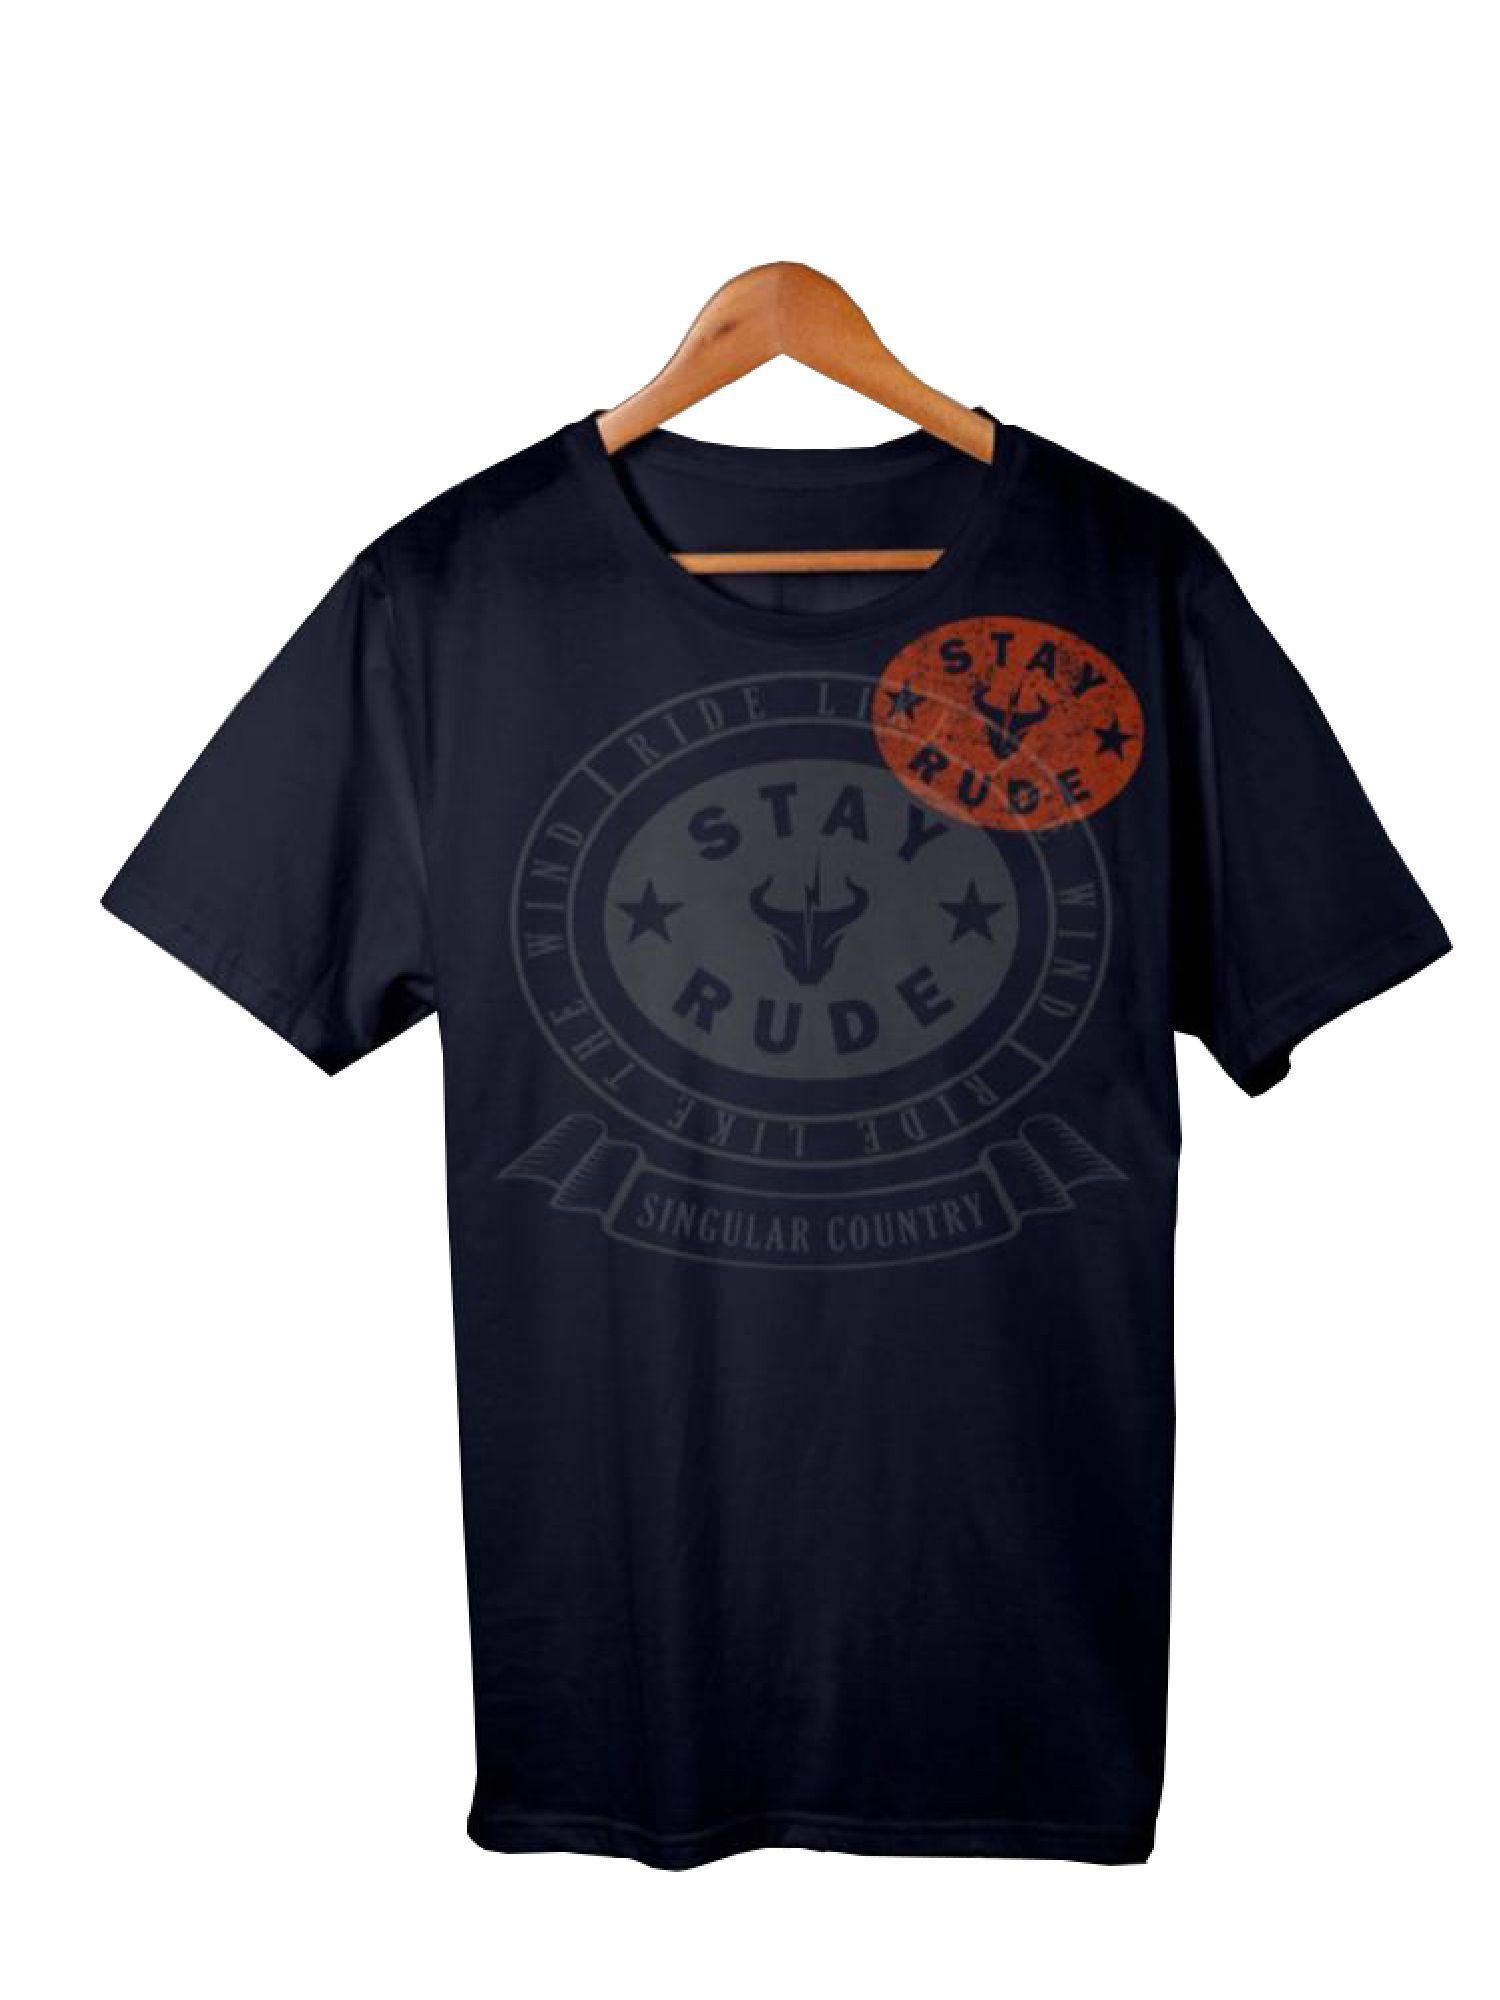 Camiseta Masculina Stay Rude Ride Like Blue/Orange